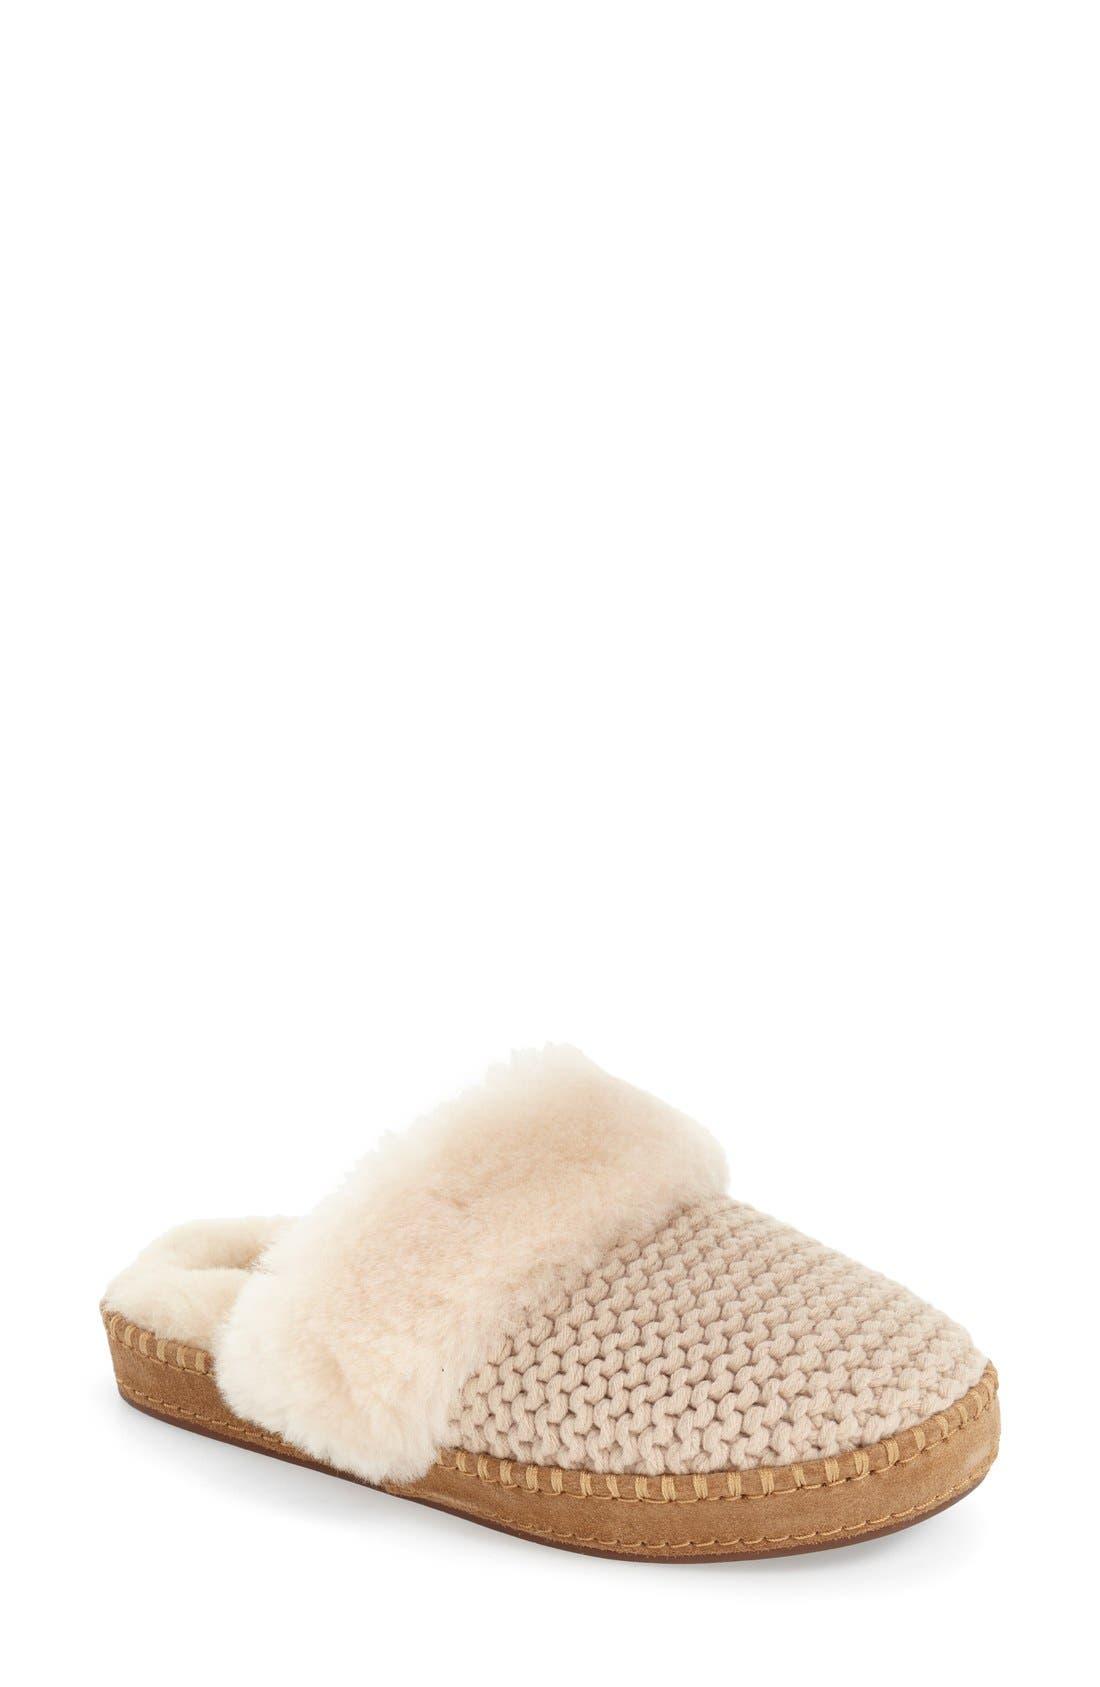 Alternate Image 1 Selected - UGG® Aira Knit Scuff Slipper (Women)